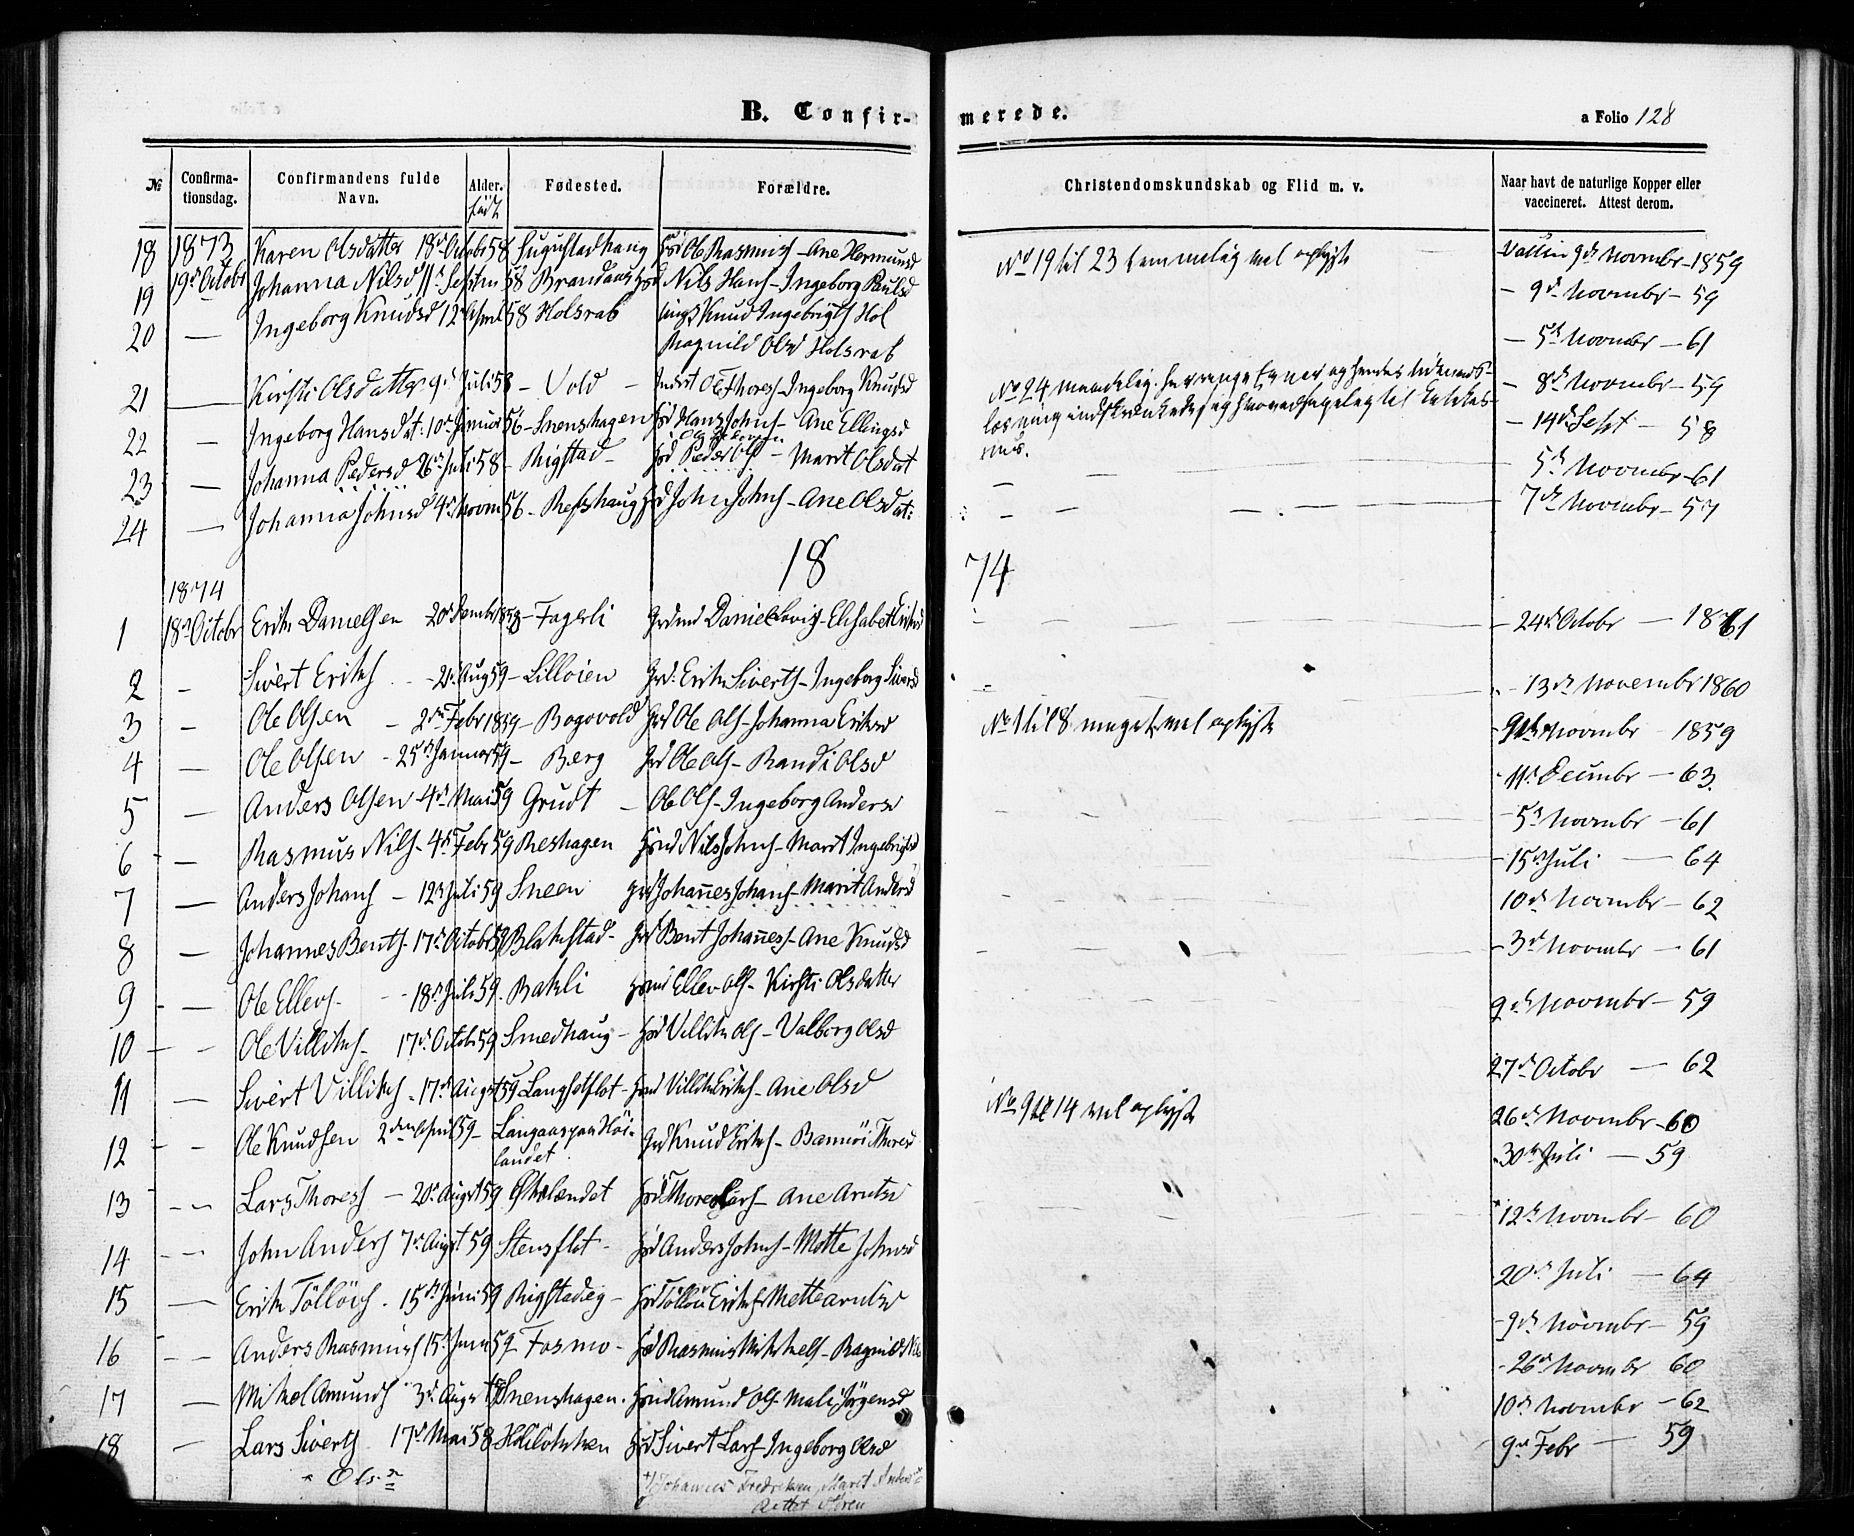 SAT, Ministerialprotokoller, klokkerbøker og fødselsregistre - Sør-Trøndelag, 672/L0856: Parish register (official) no. 672A08, 1861-1881, p. 128